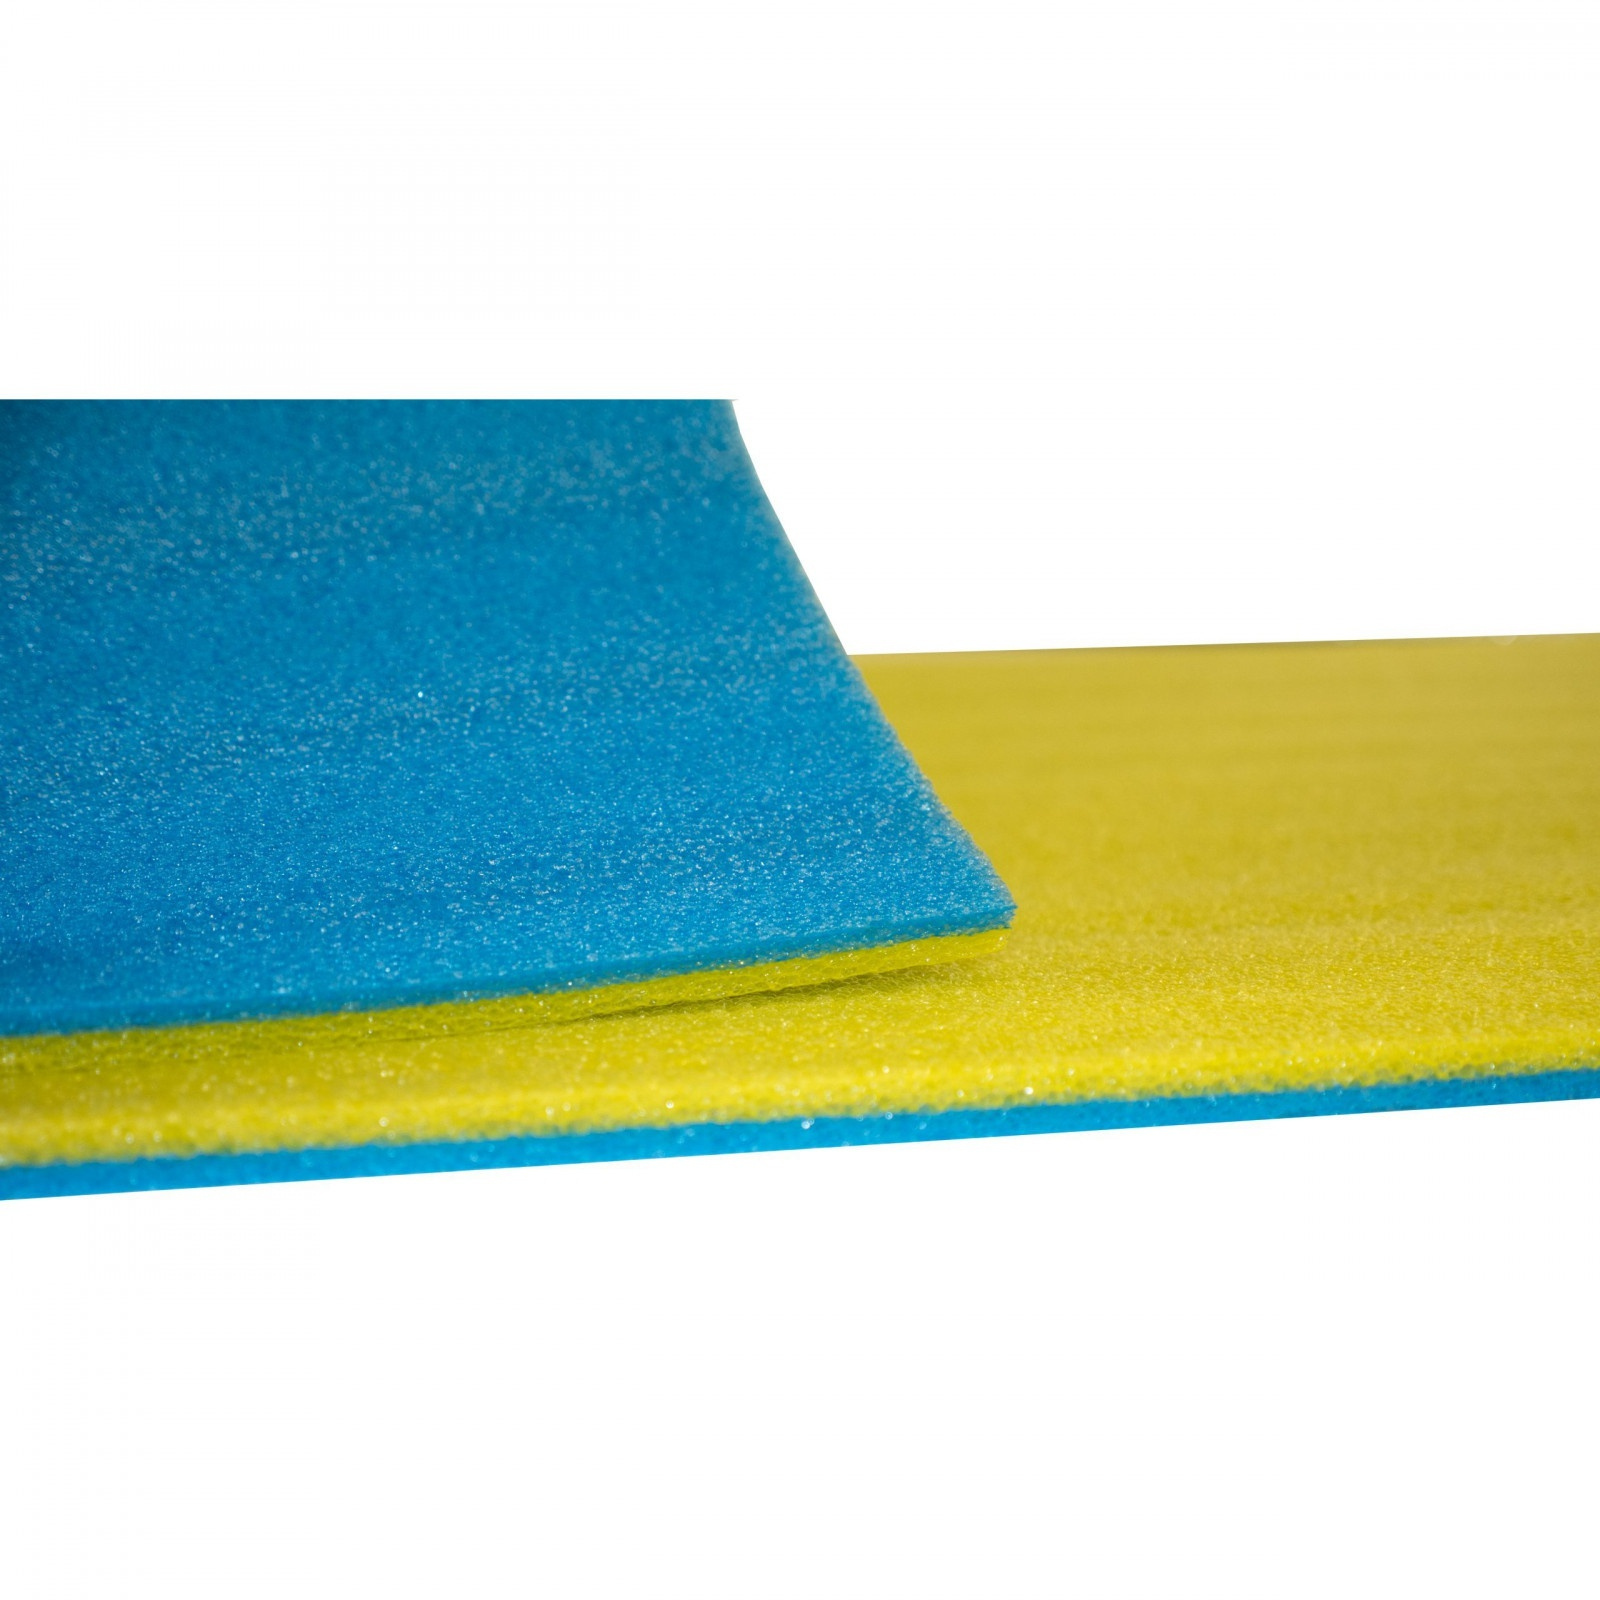 karimatka penová podložka 180x50x1cm zelenomodrá fitness jóga megamix.sk